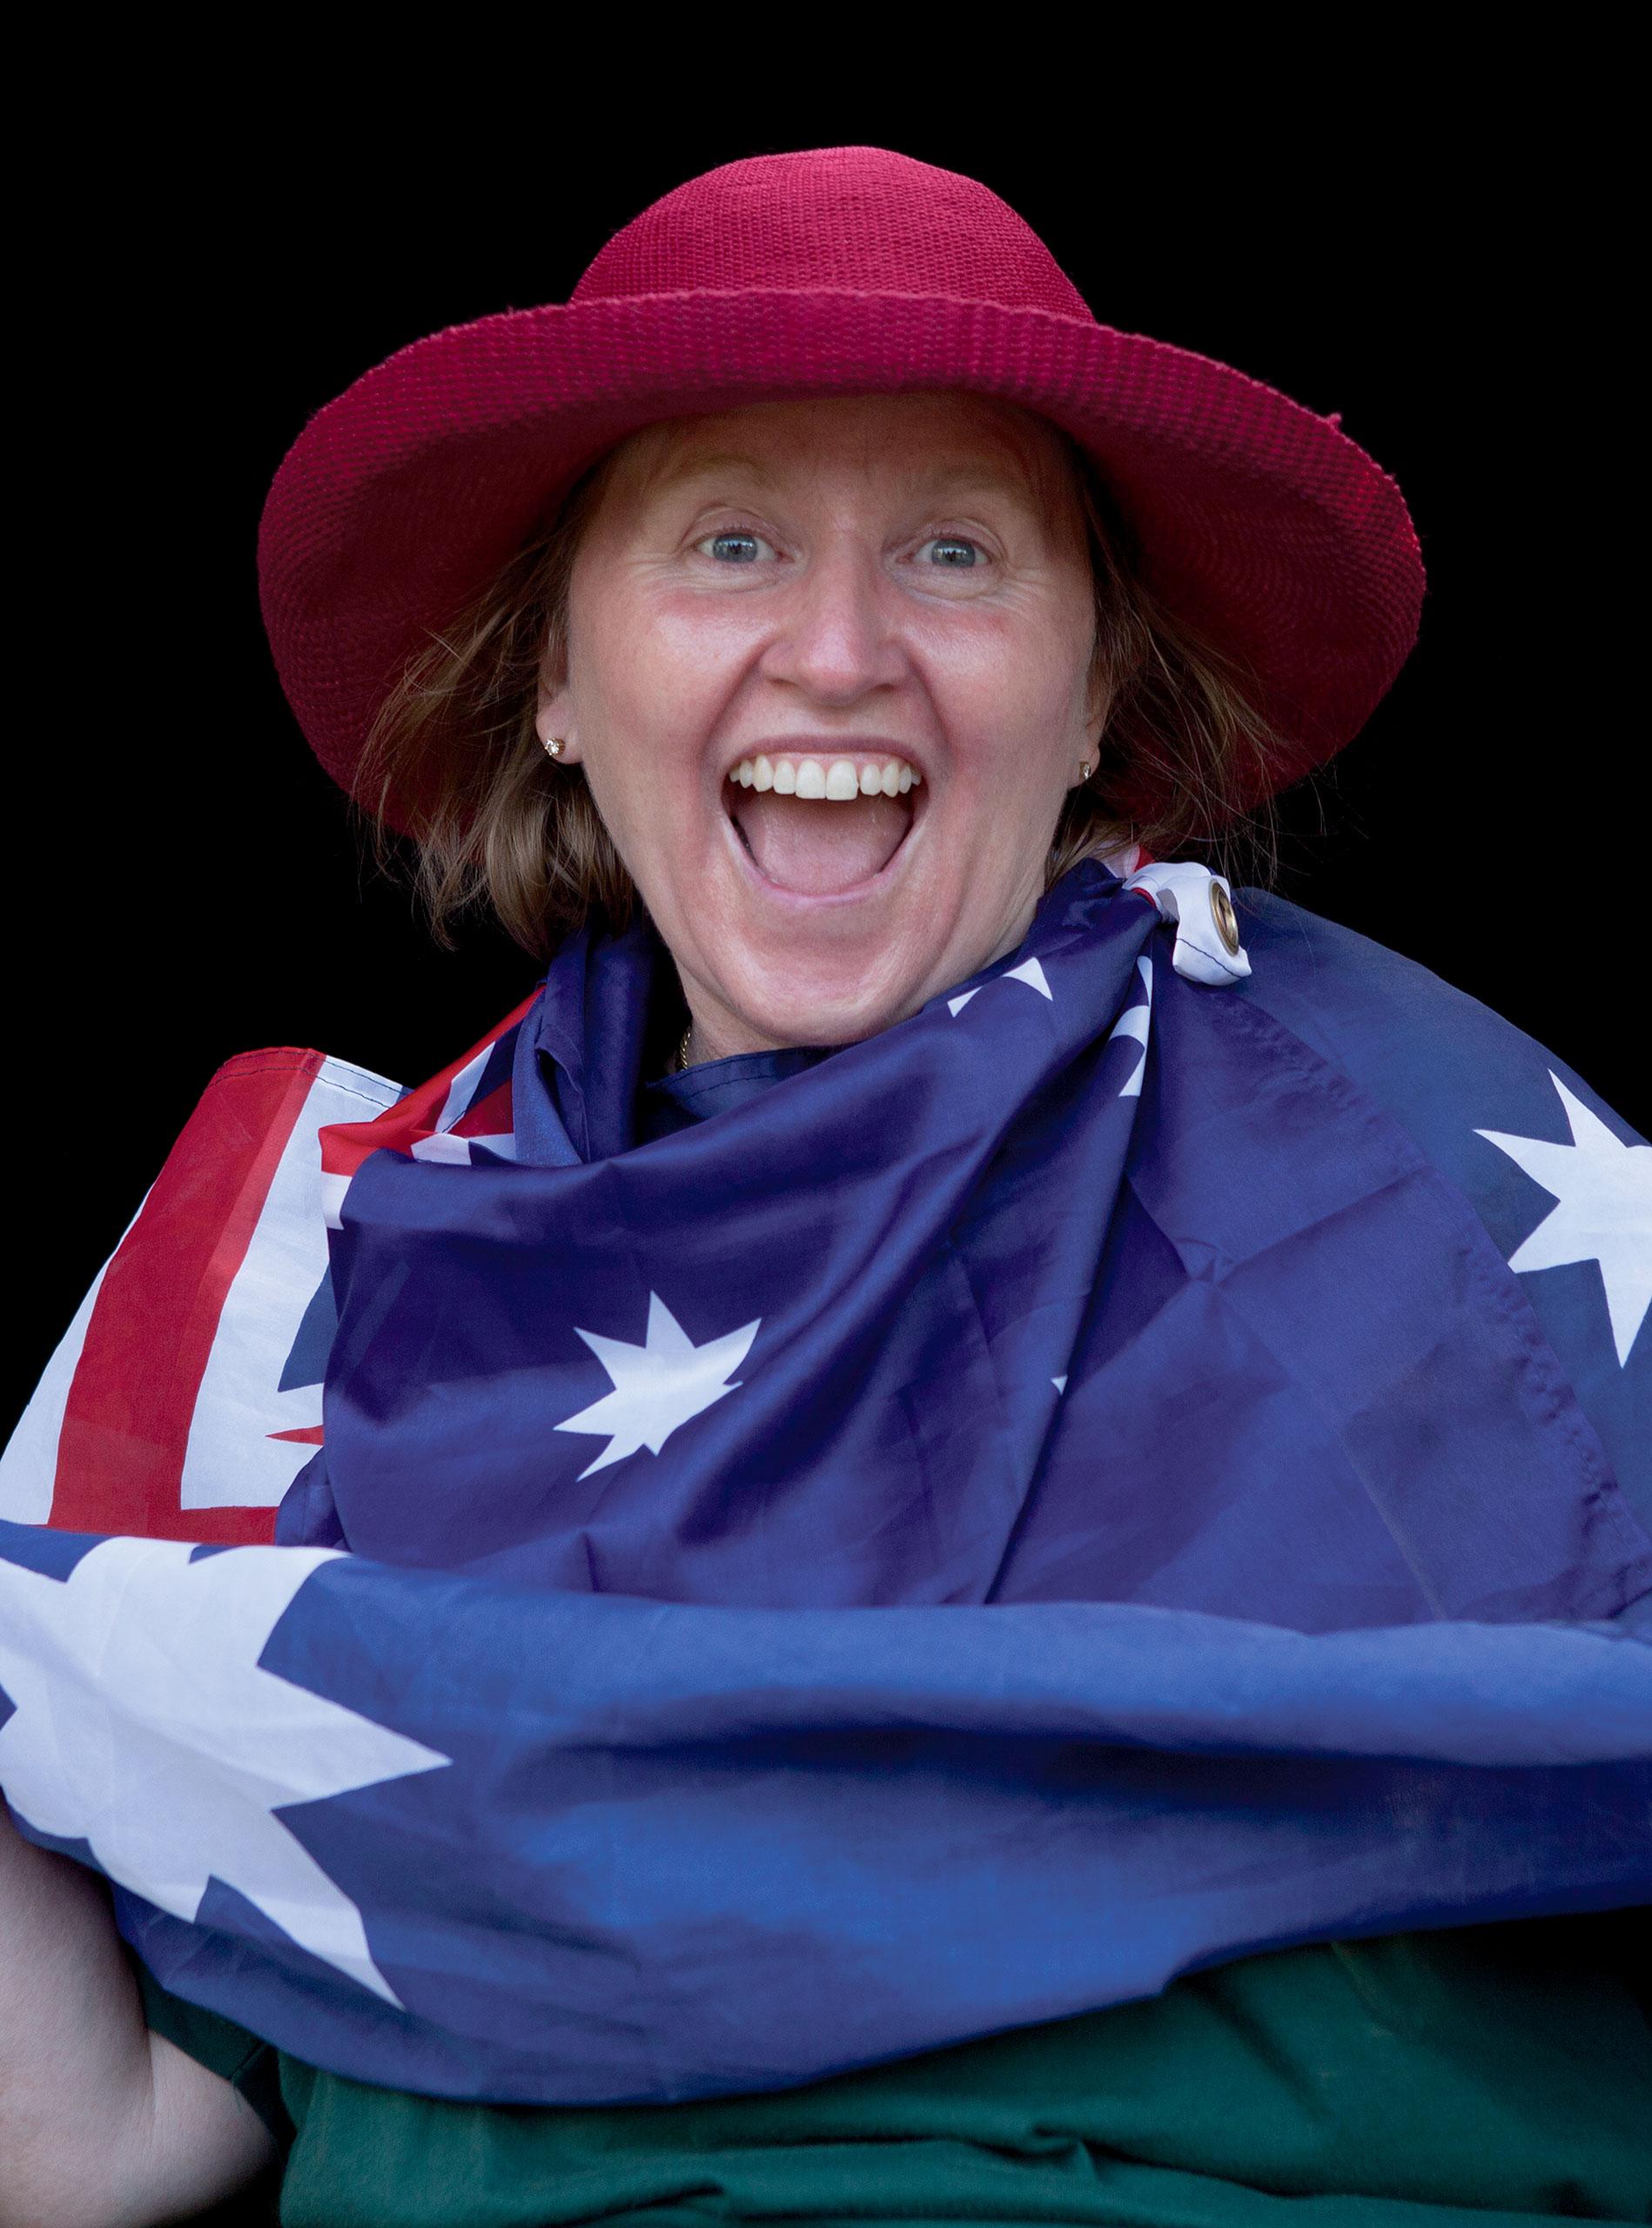 Dianne from Australia